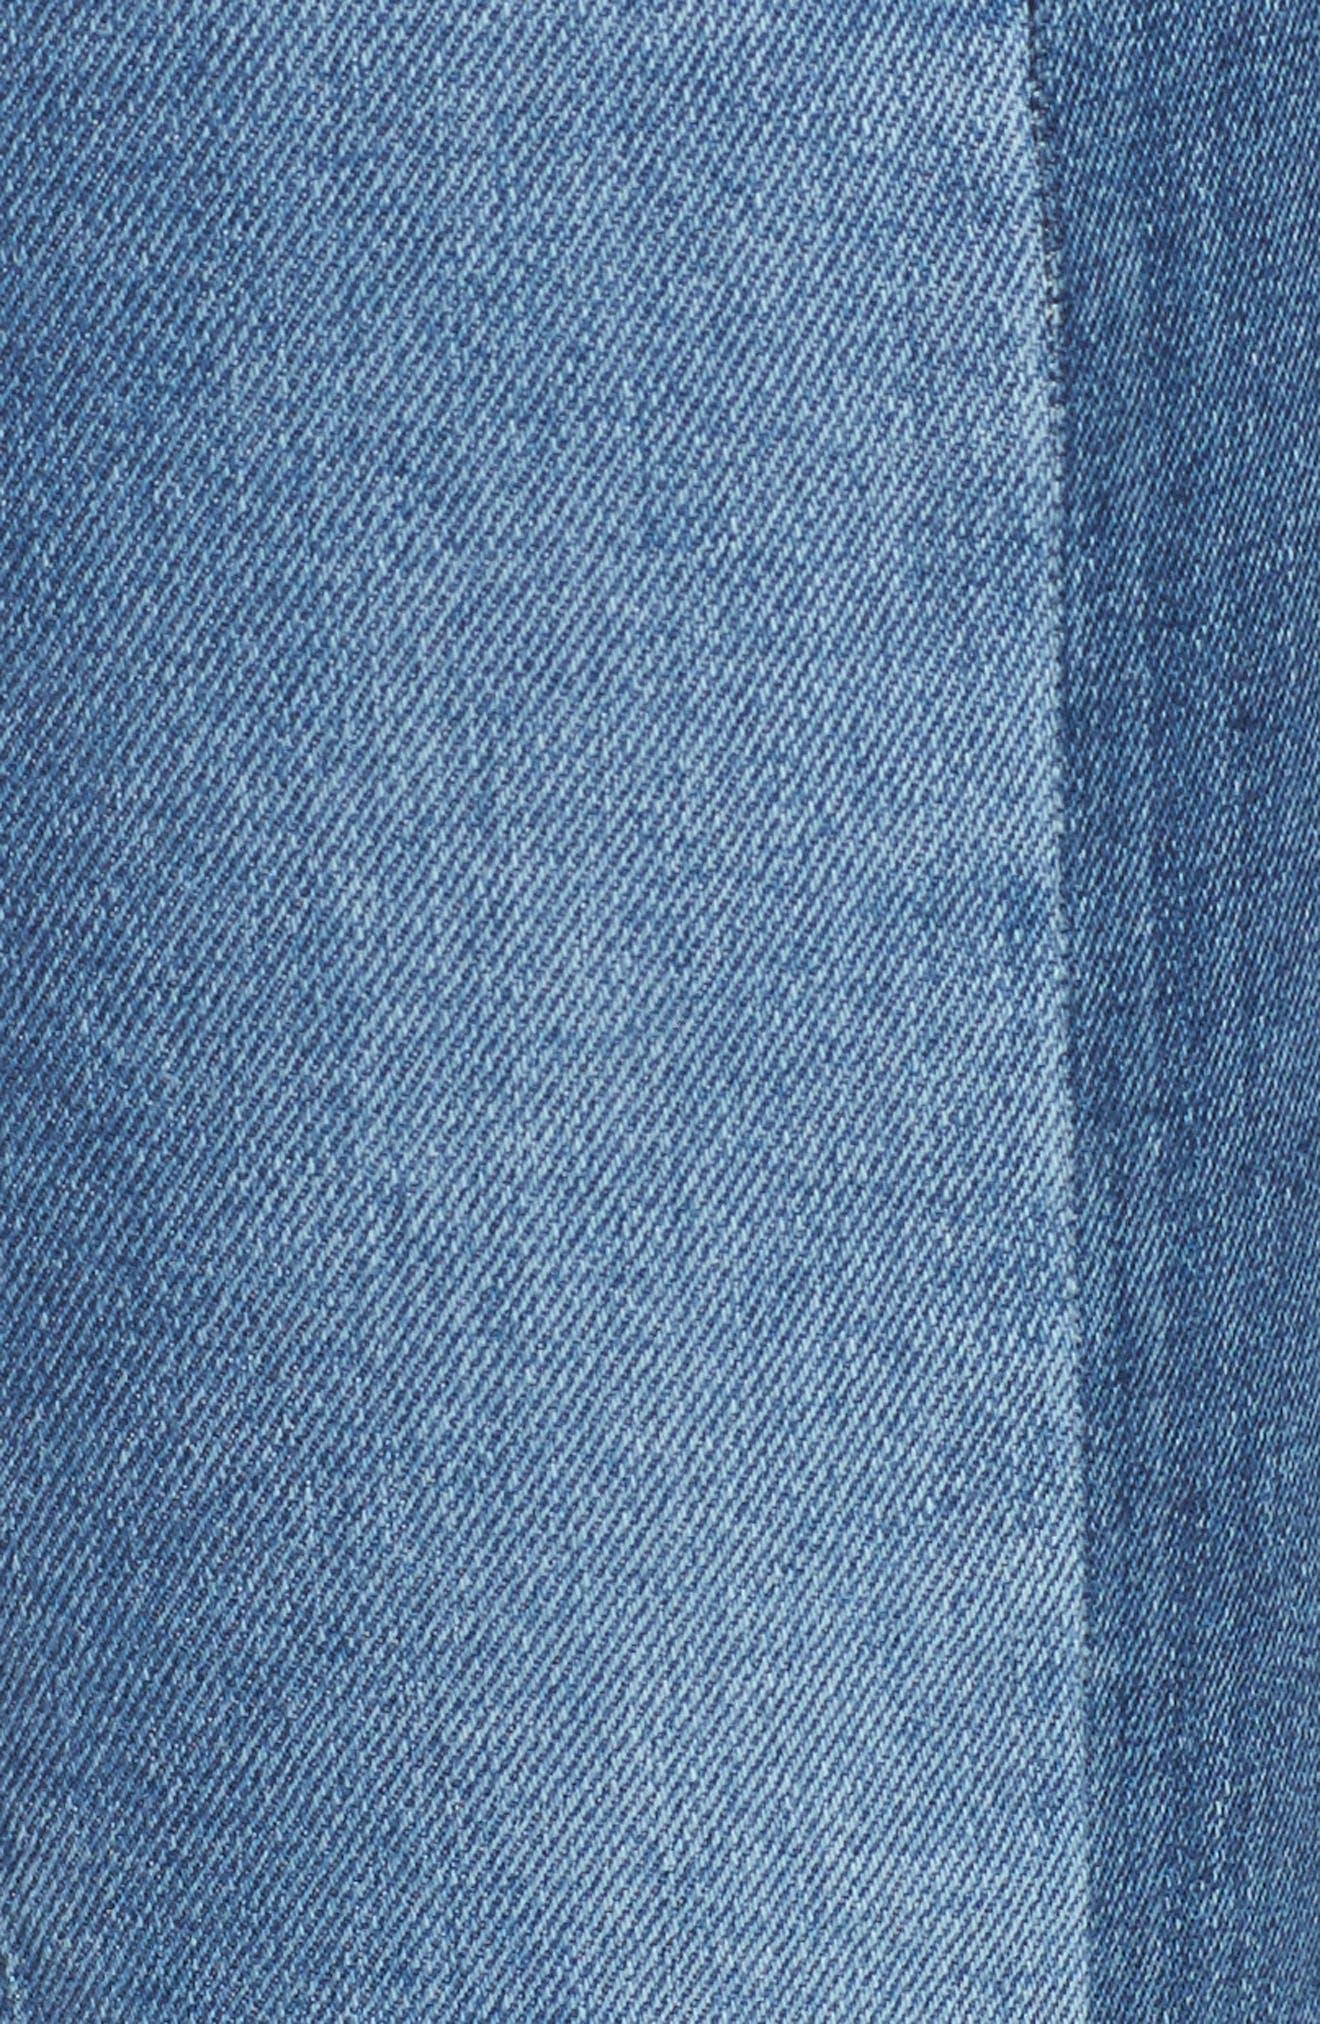 Alternate Image 5  - Mavi Jeans Tess Blocked Super Skinny Jeans (Mid Gold Icon)